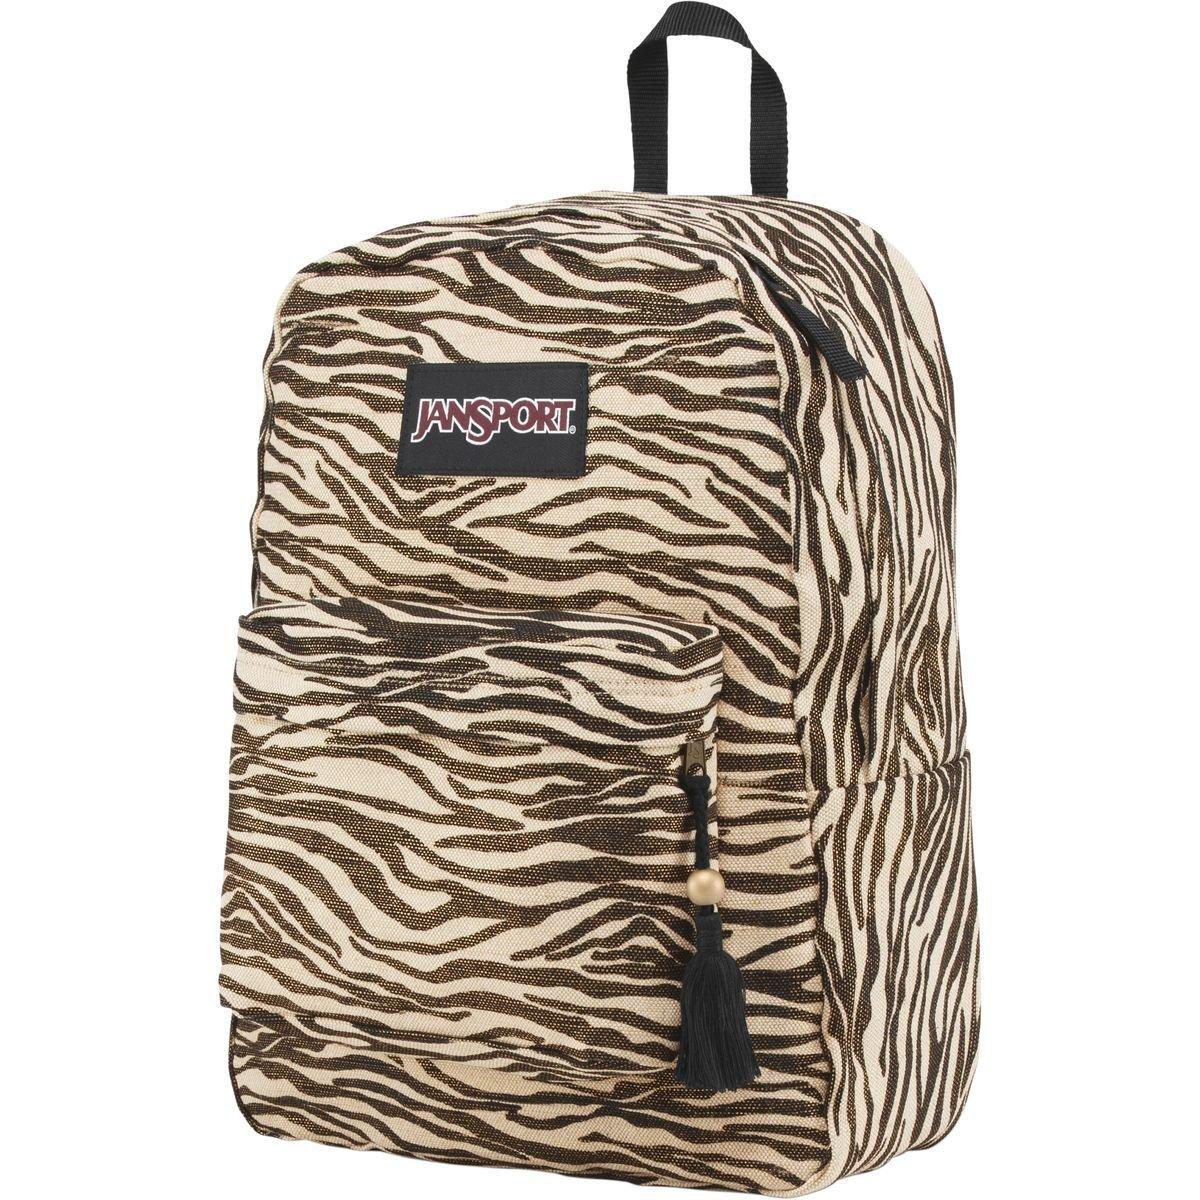 "JanSport Super FX Backpack - Gold Metallic Zebra / 16.7""H x 13""W x 8.5""D"